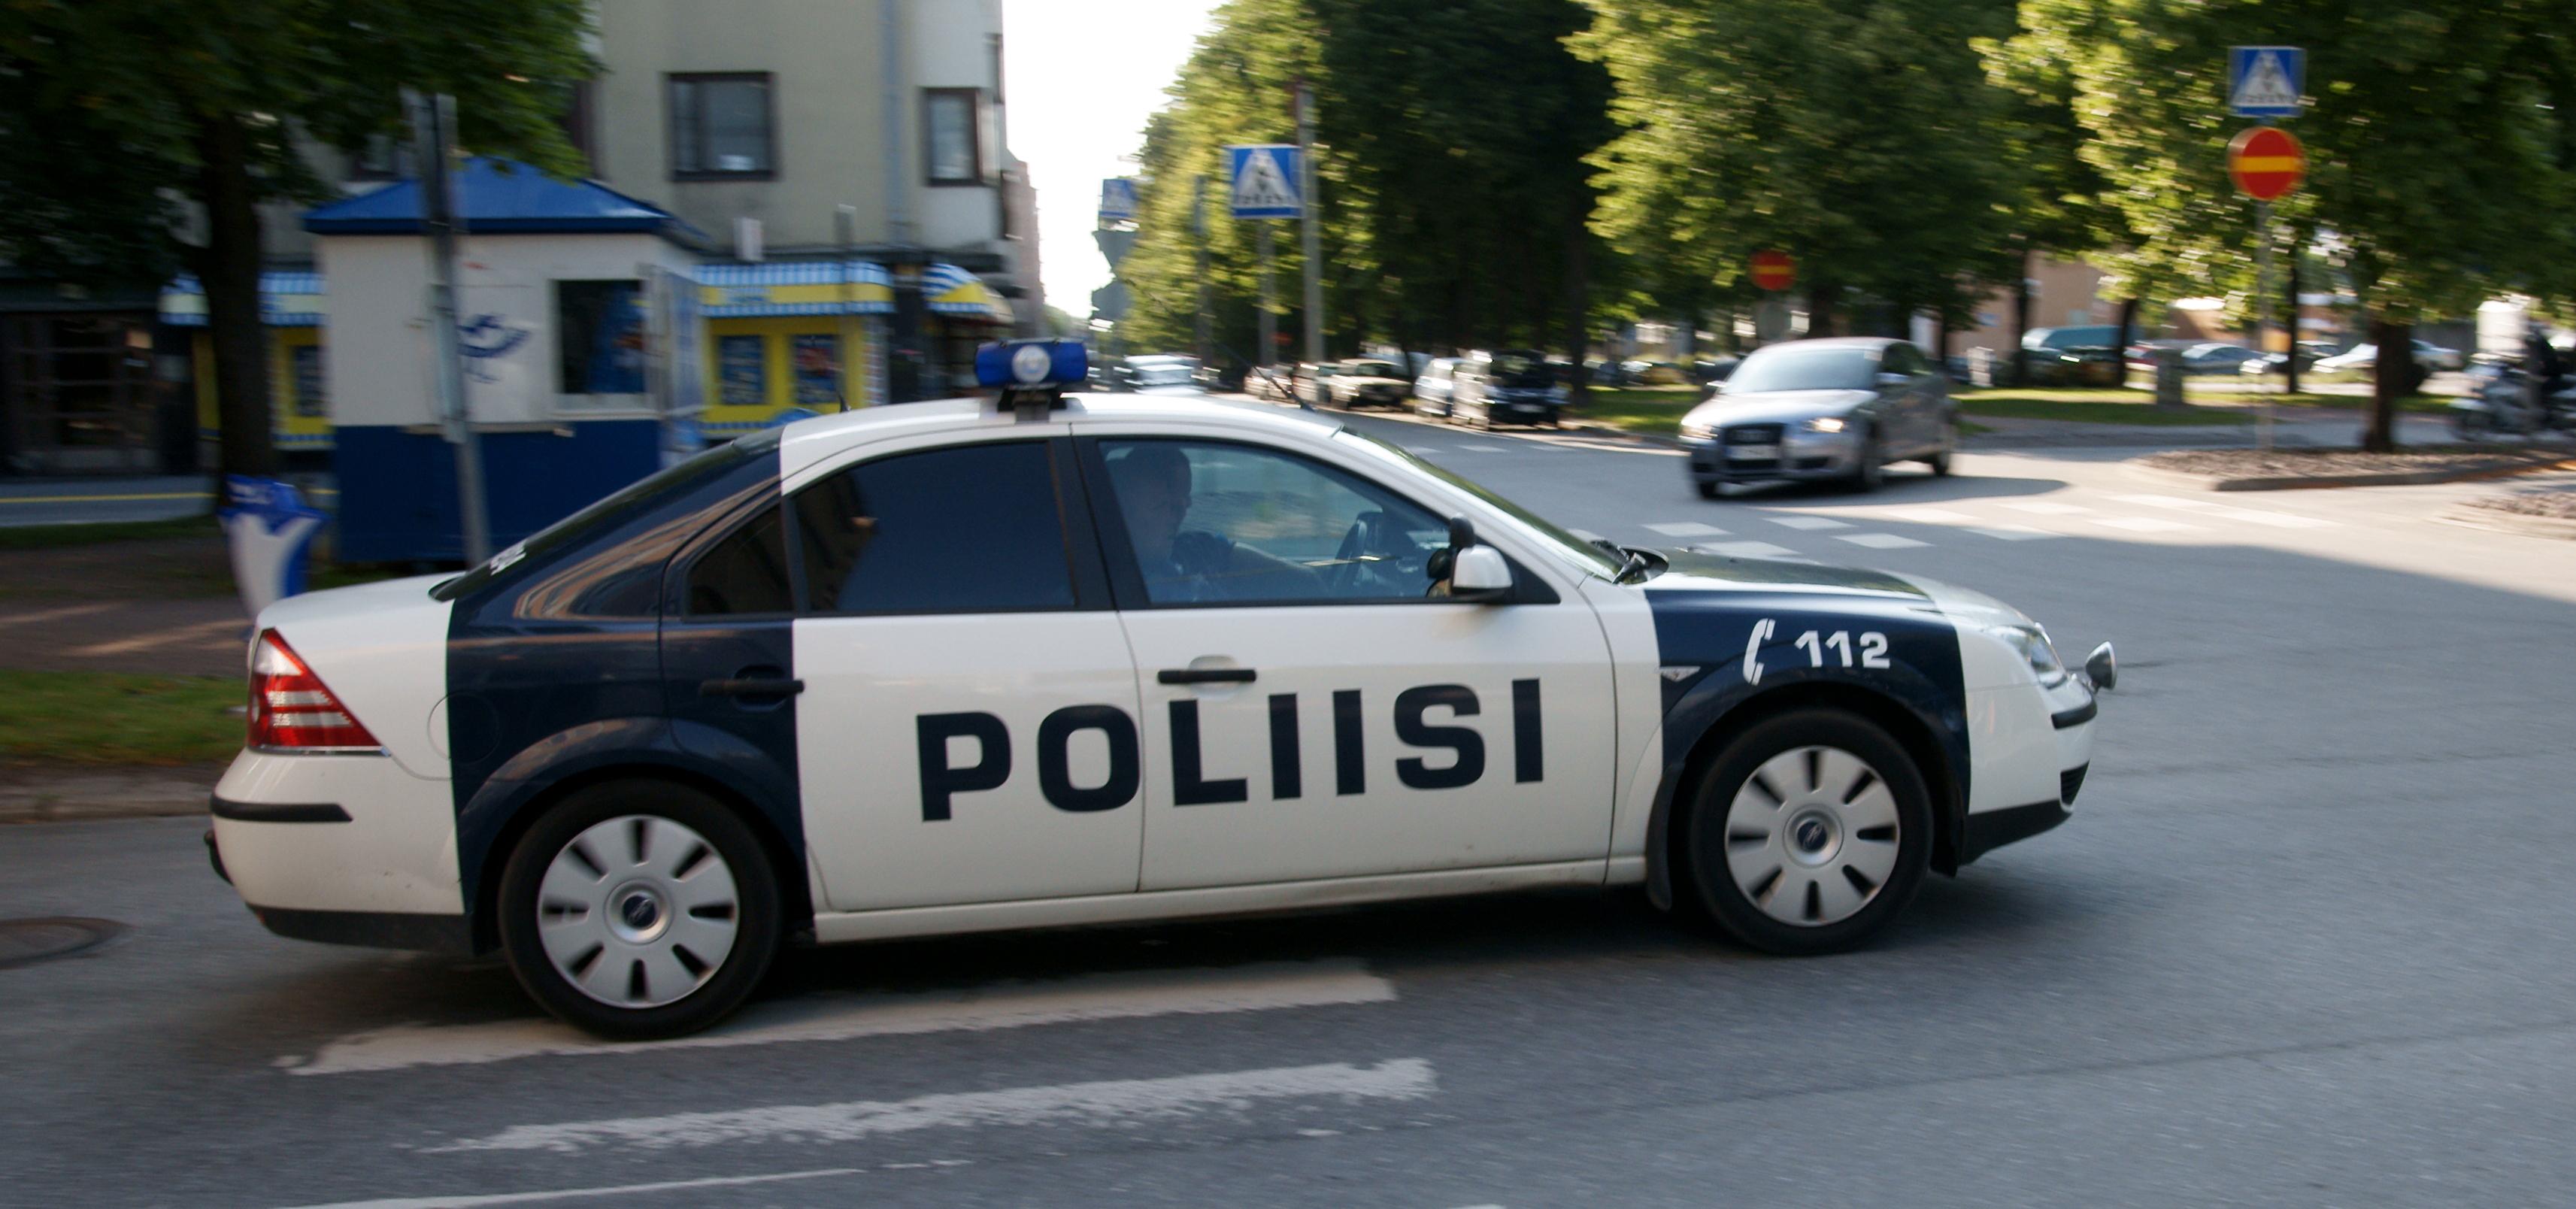 [Image: Poliisi.JPG]